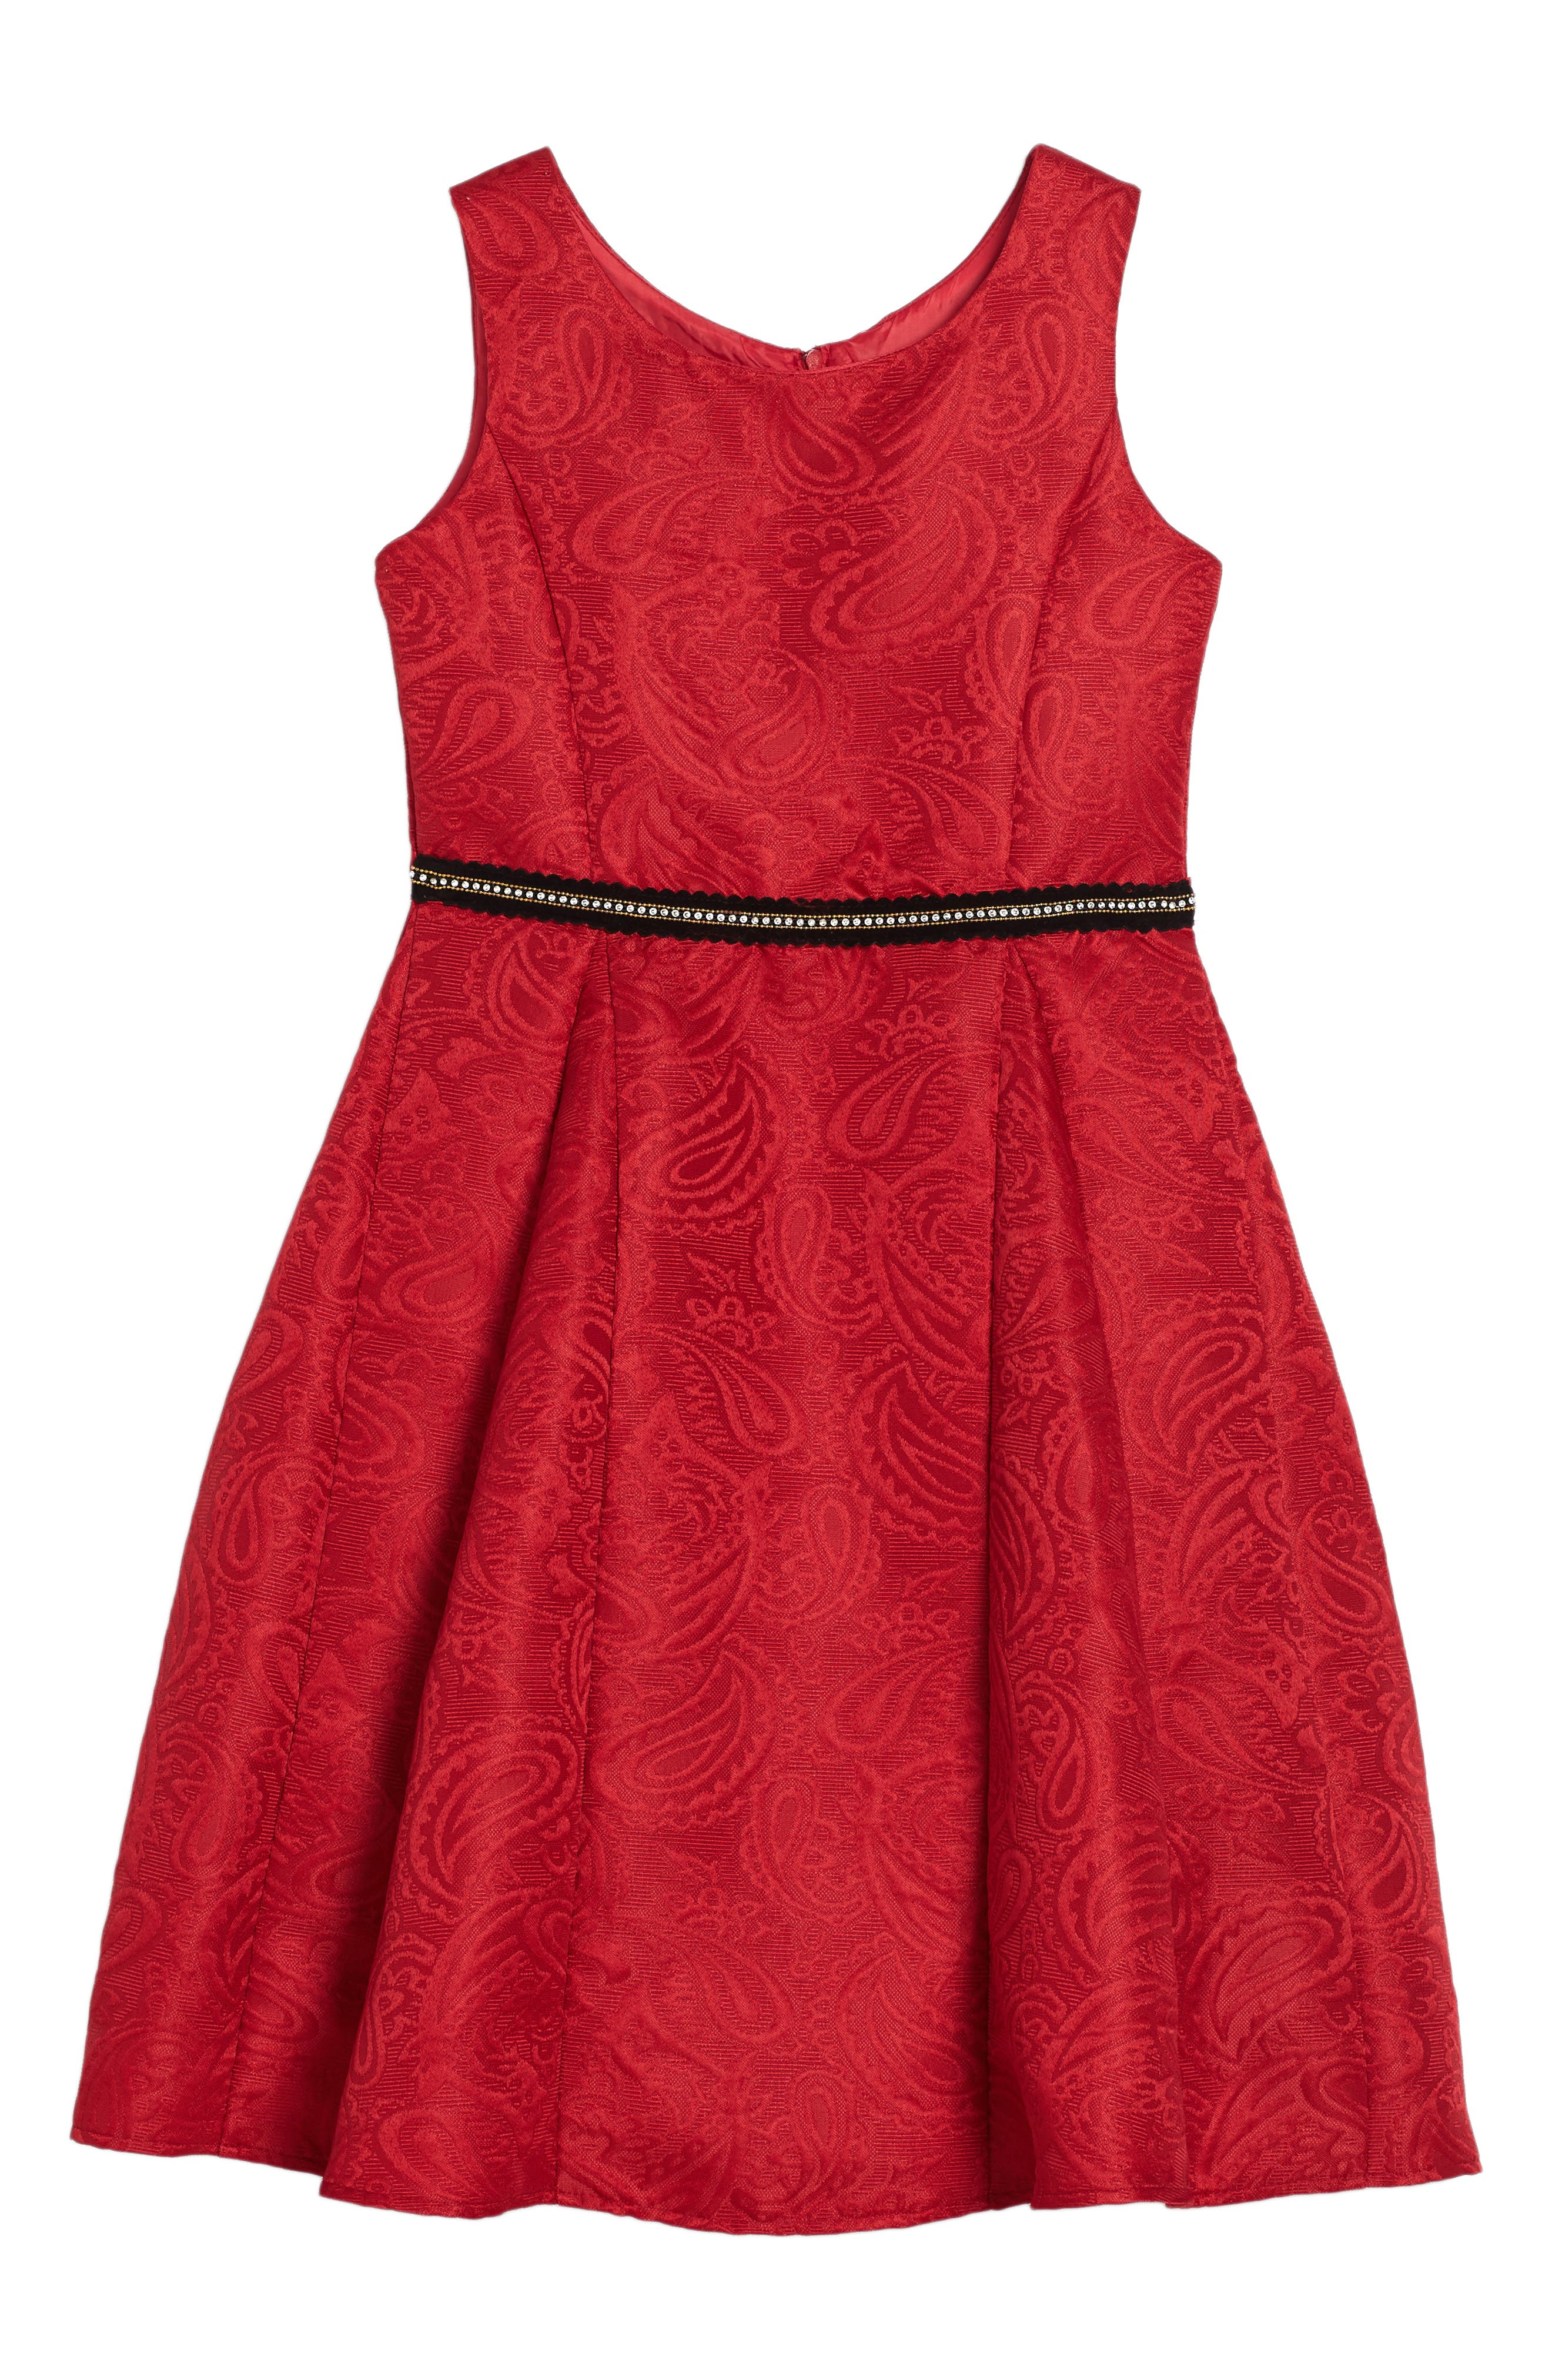 Hannah Jacquard Dress,                             Main thumbnail 1, color,                             600